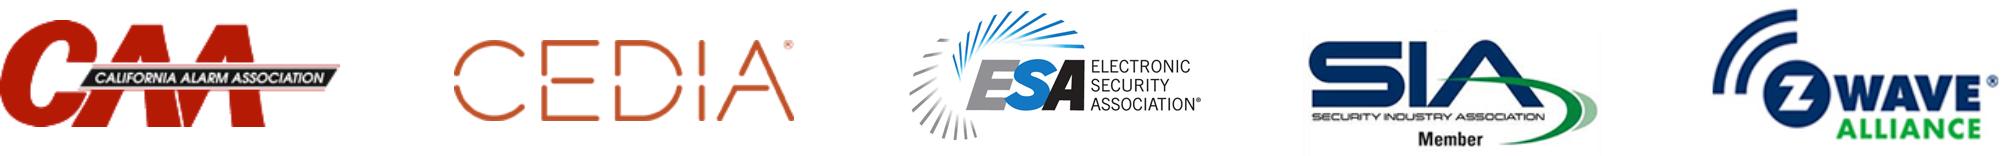 Members of CAA, CEDIA, ESA, SIA, Z-Wave Alliance